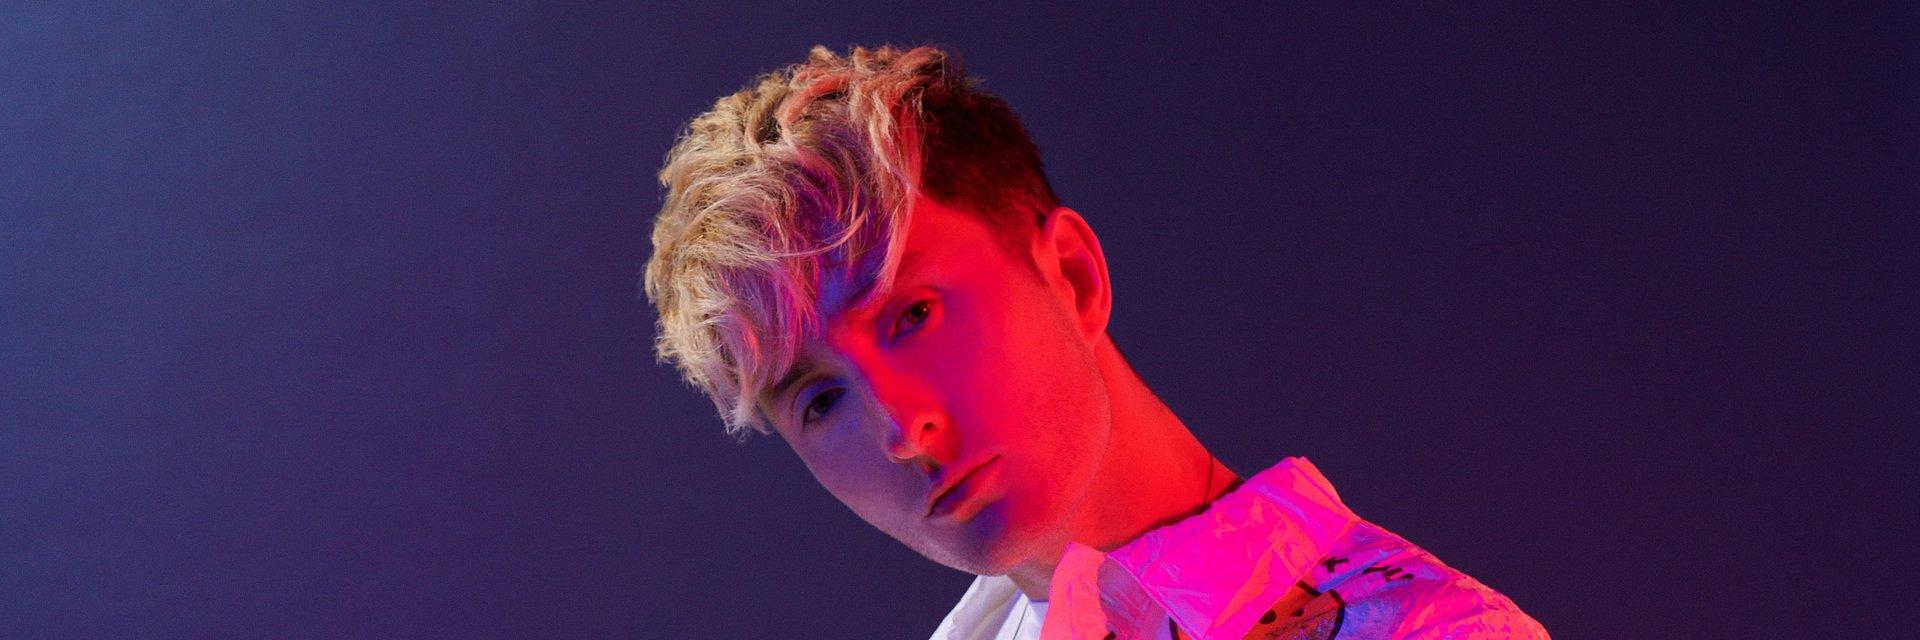 """Dublińska odpowiedź na Calvina Harrisa"": Daniel Blume z singlem ""Out of Time"""